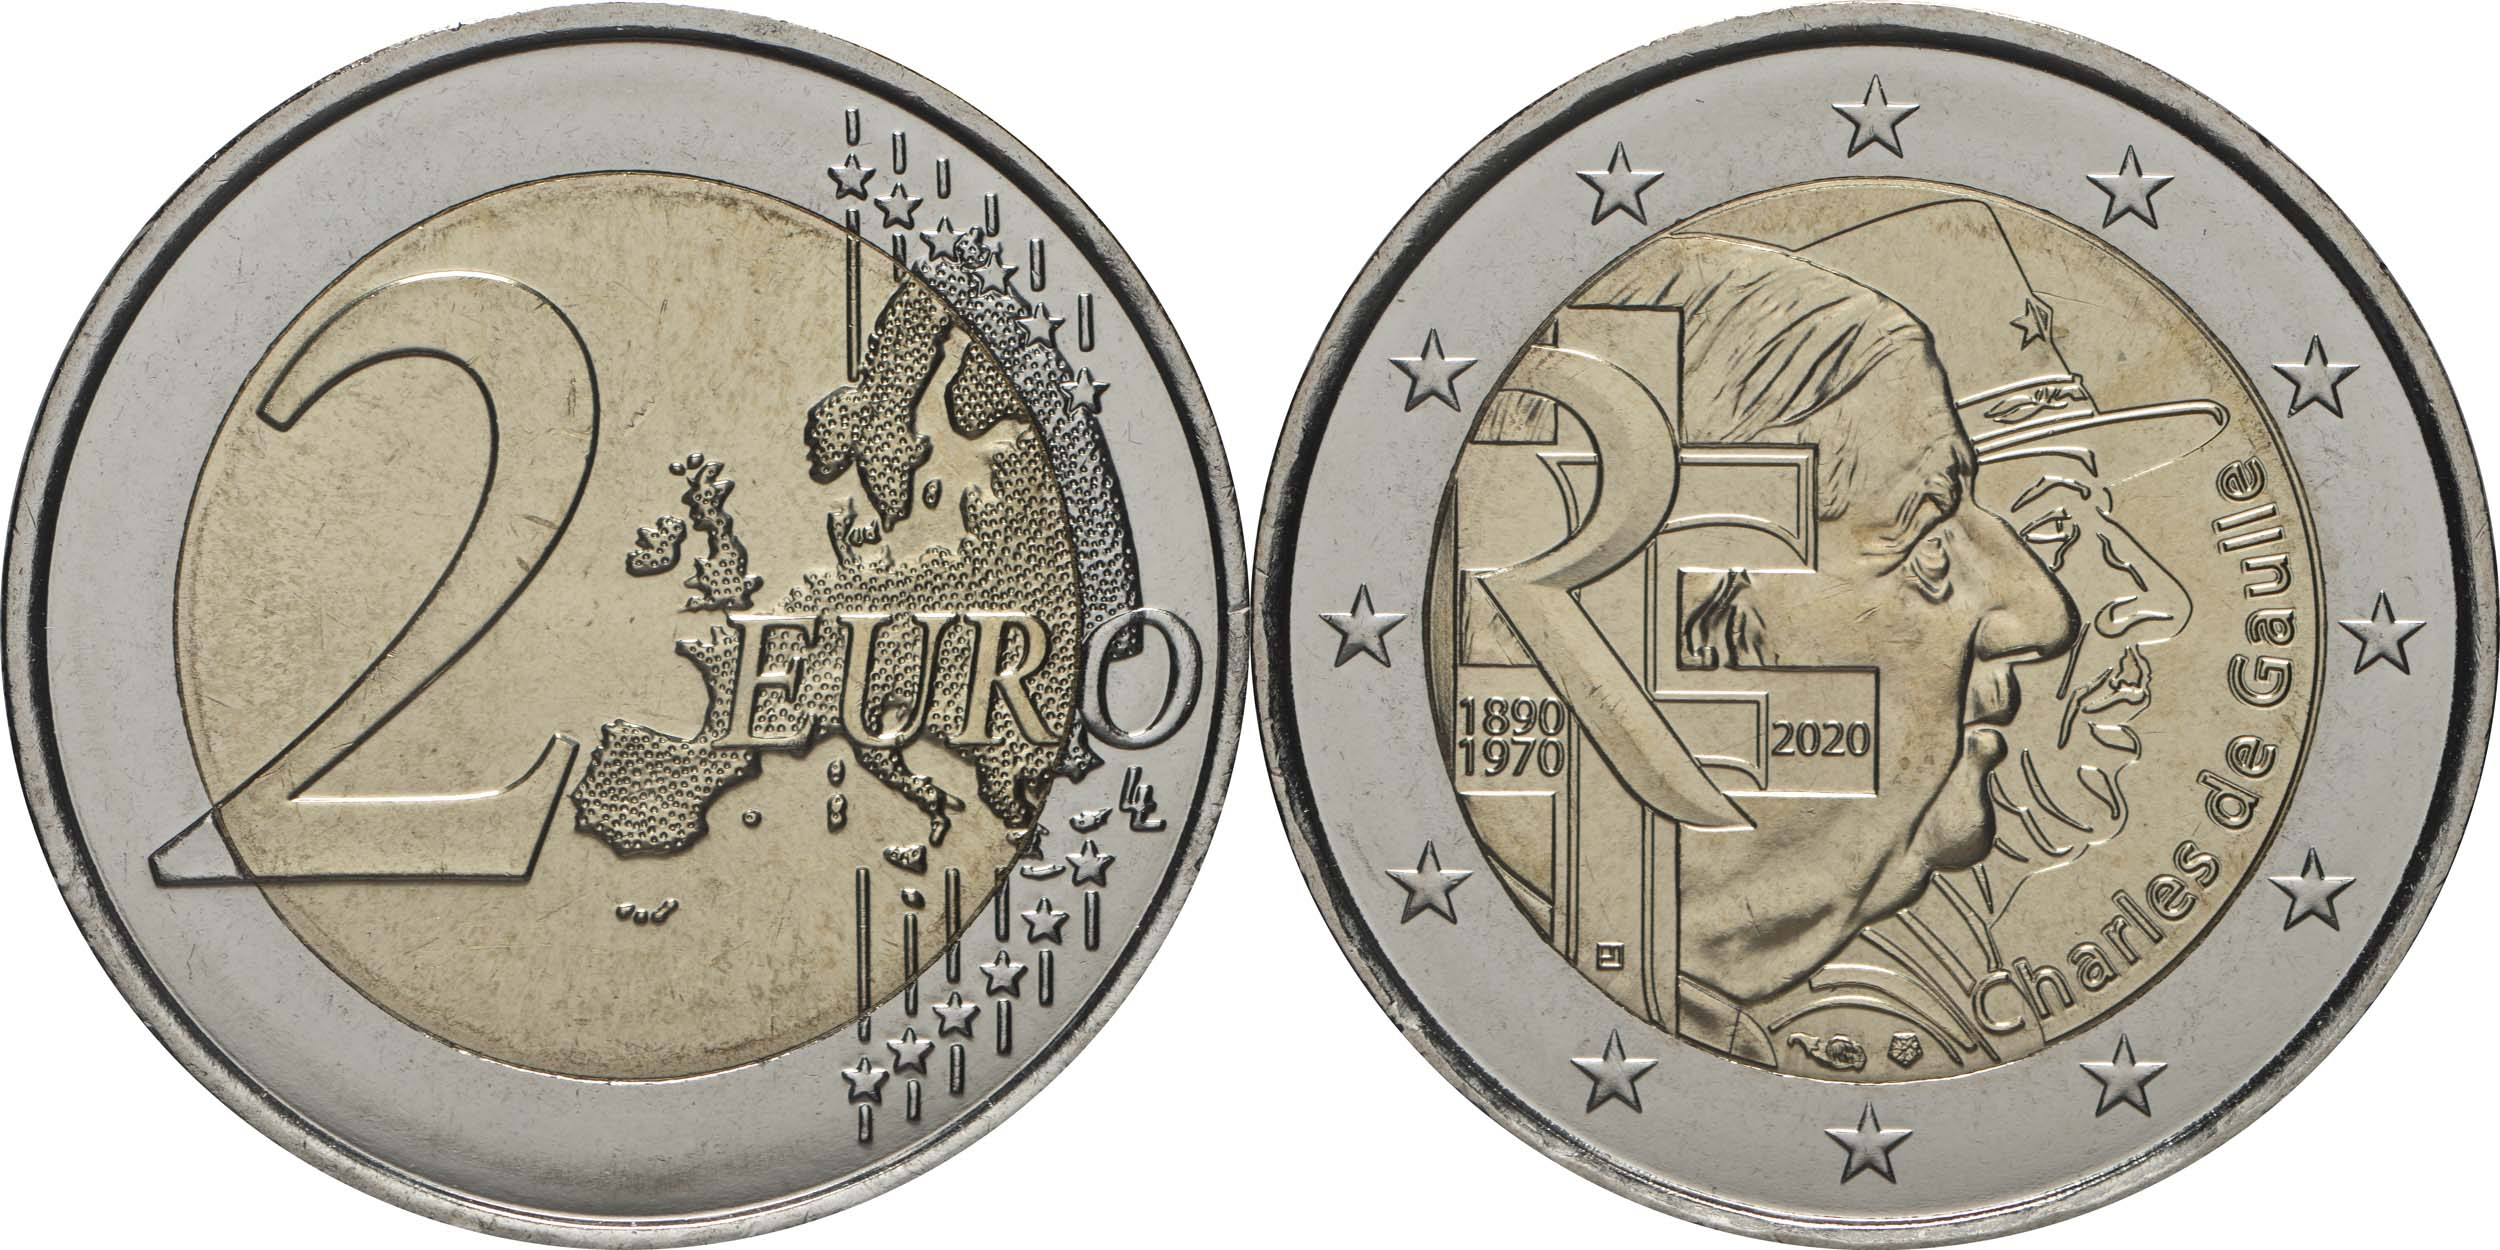 Lieferumfang:Frankreich : 2 Euro Charles de Gaulle  2020 bfr